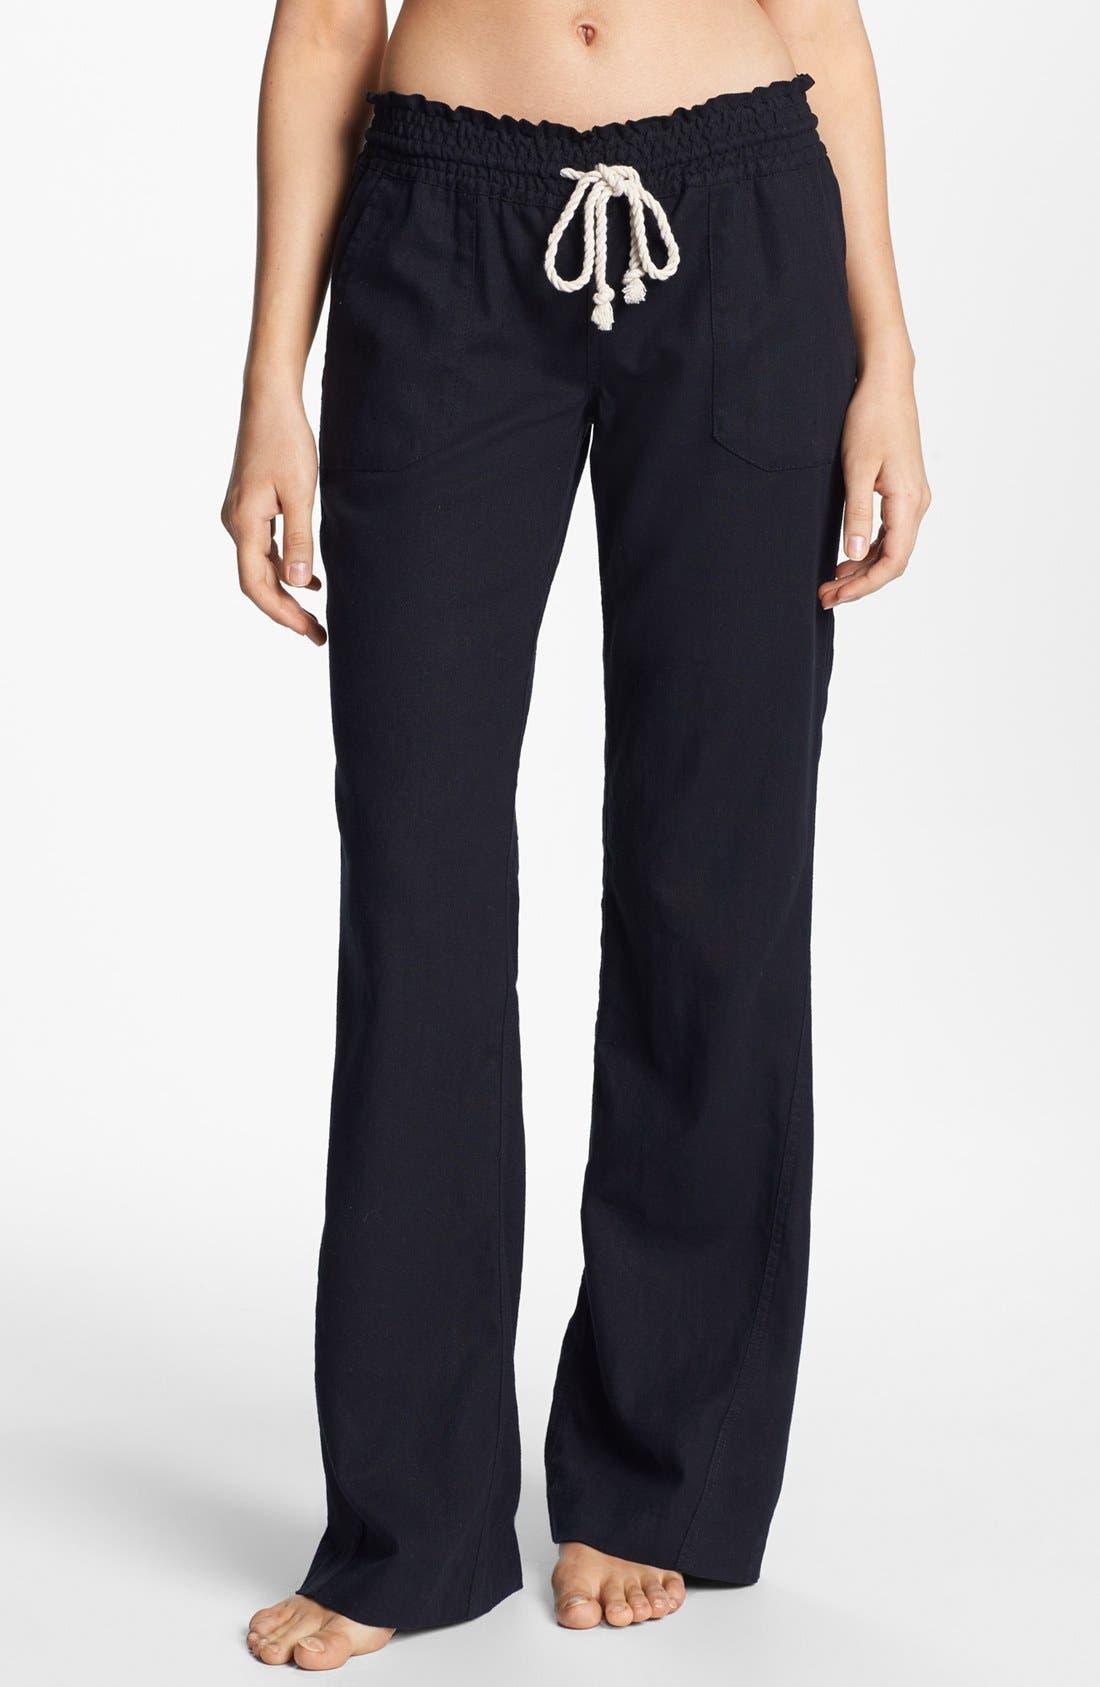 'Oceanside' Beach Pants,                         Main,                         color, Black